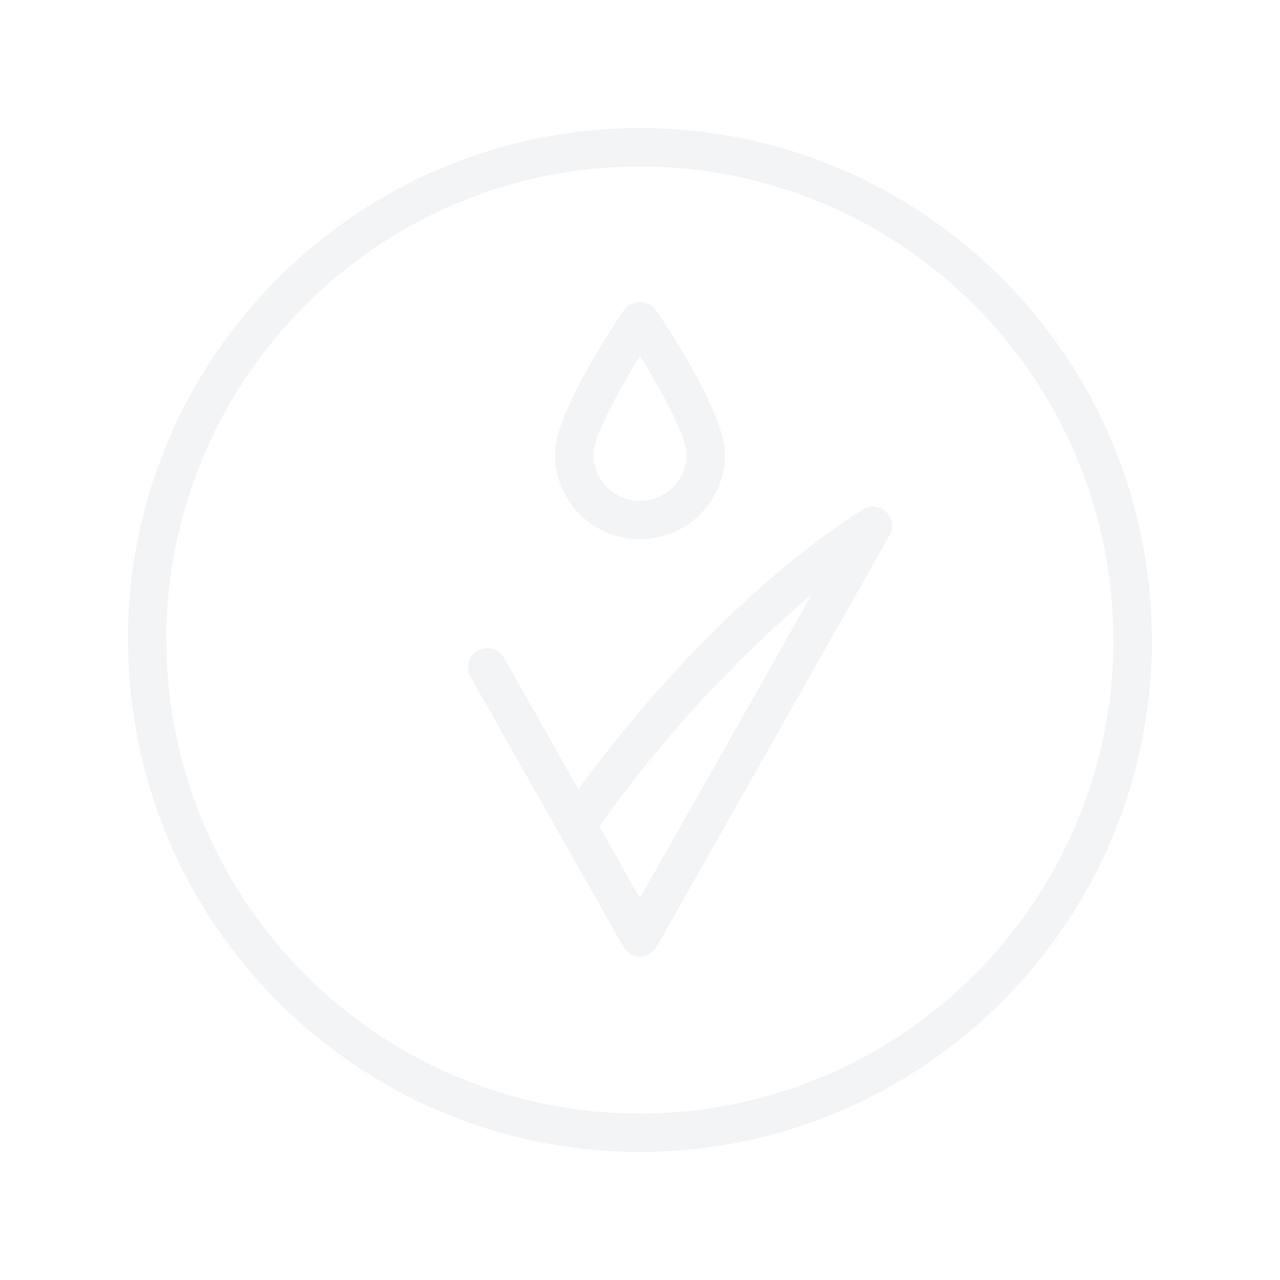 Shiseido Advanced Hydro-Liquid Compact Refill Foundation No.I20 Natural Light Ivory 12g | LOVERTE